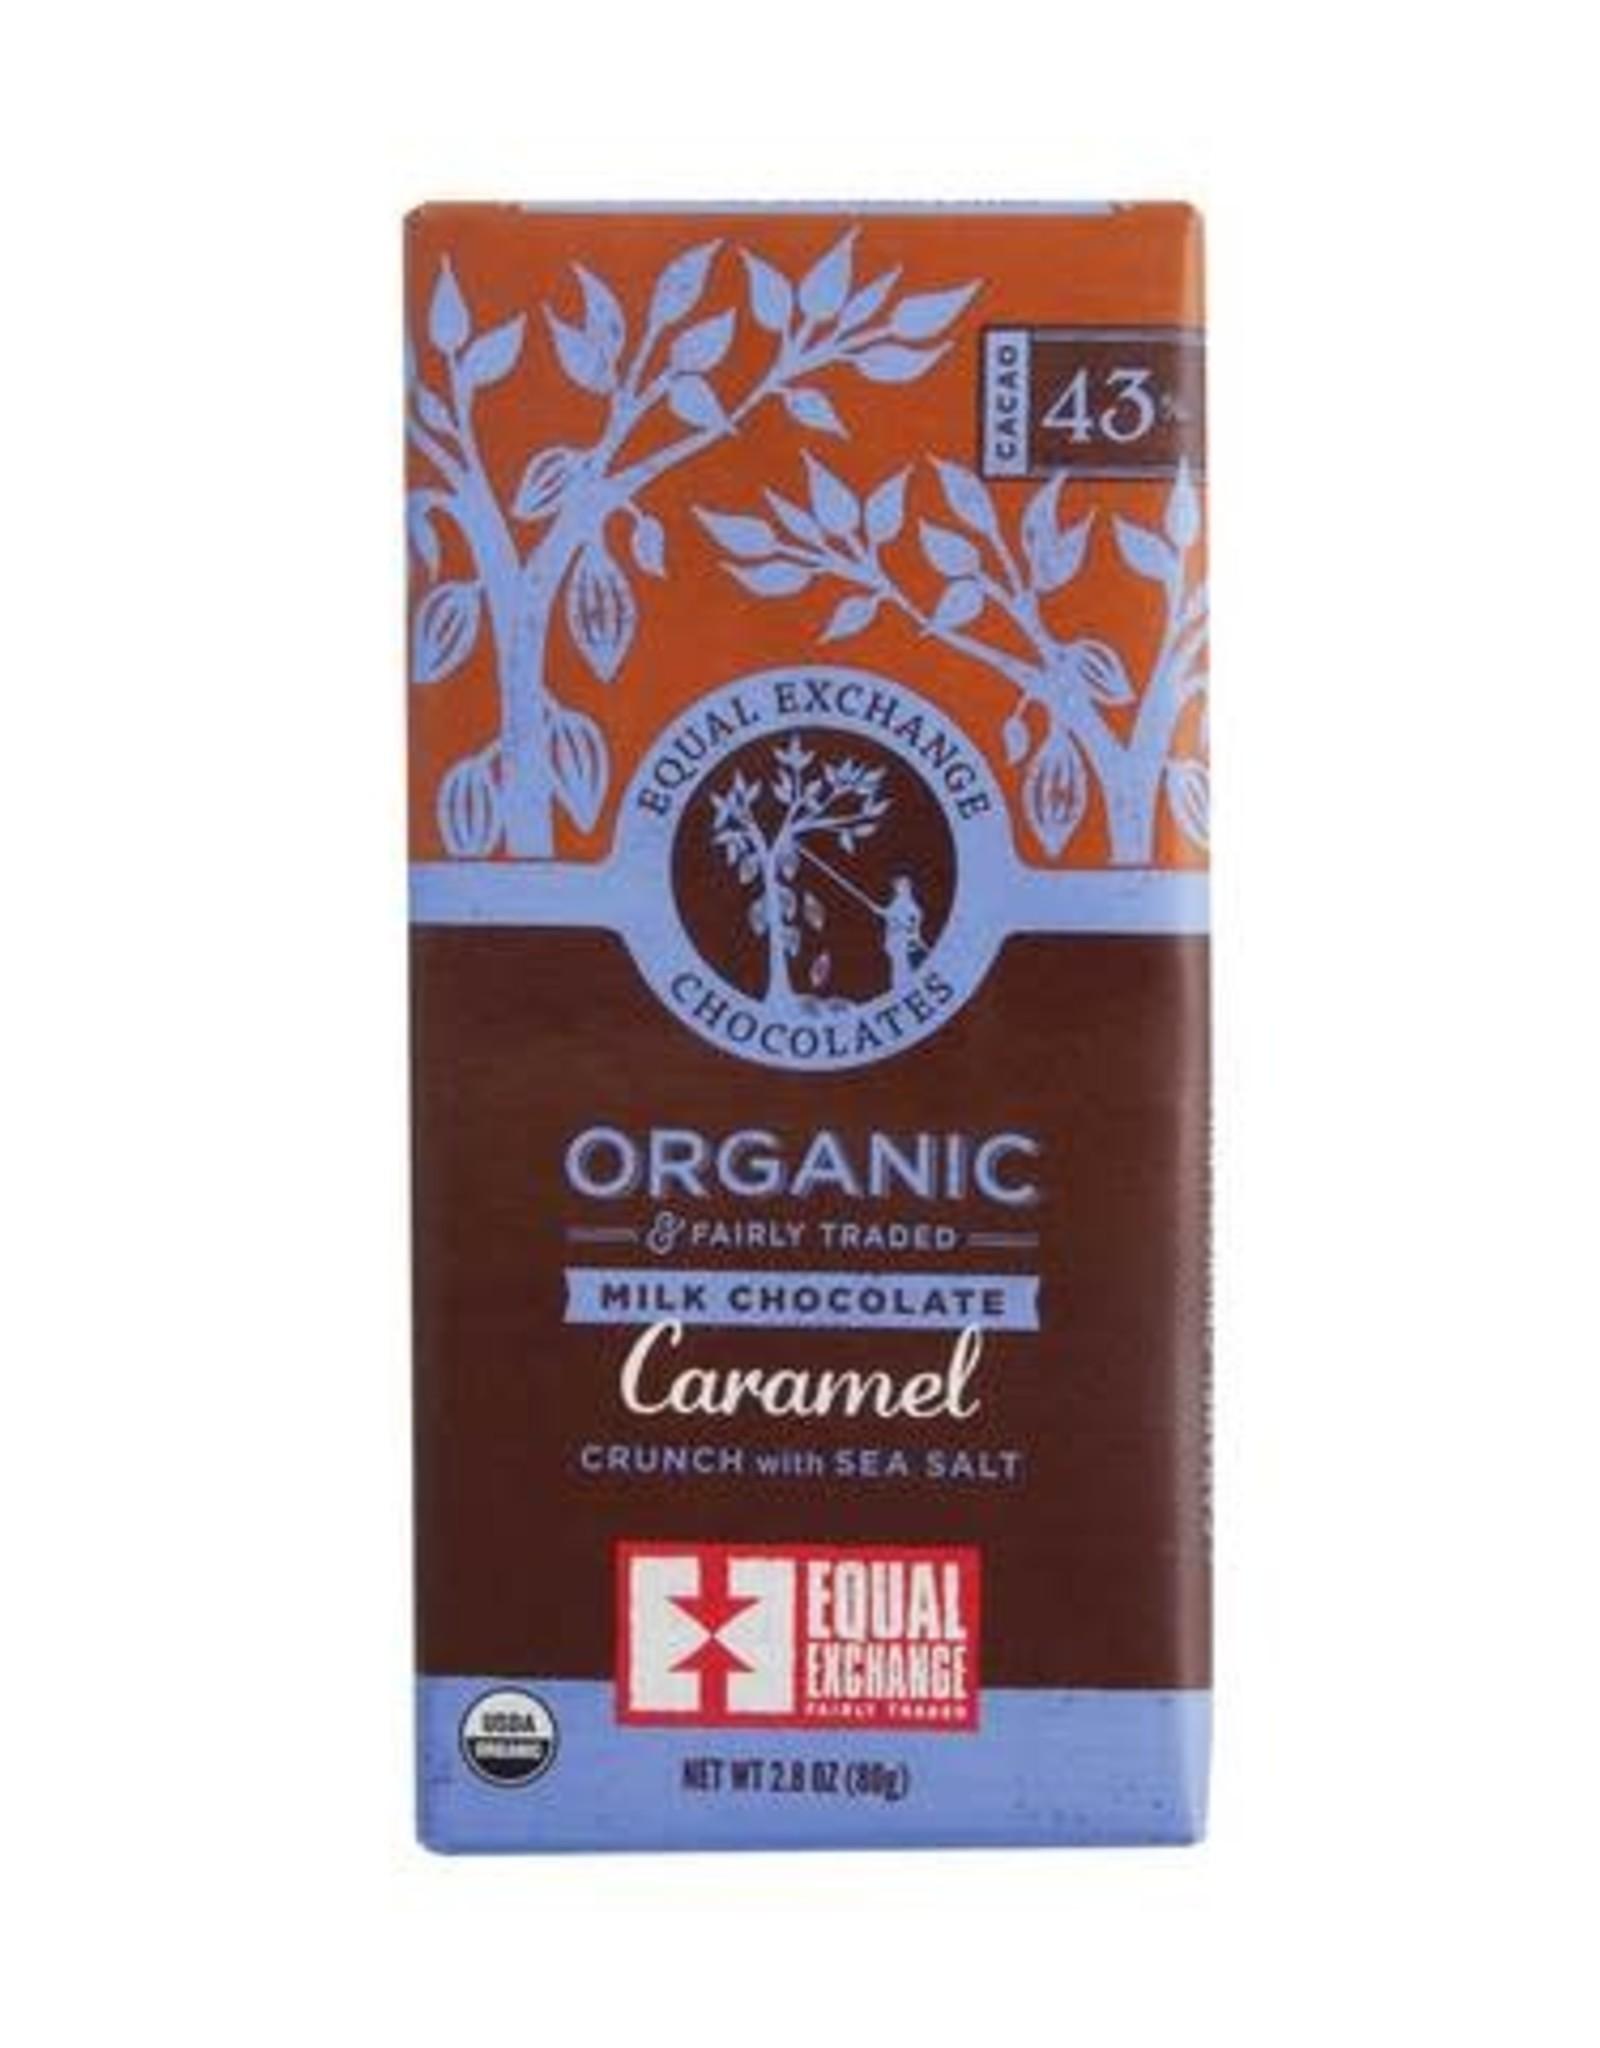 Organic Caramel Crunch with Sea Salt Milk Chocolate Bar